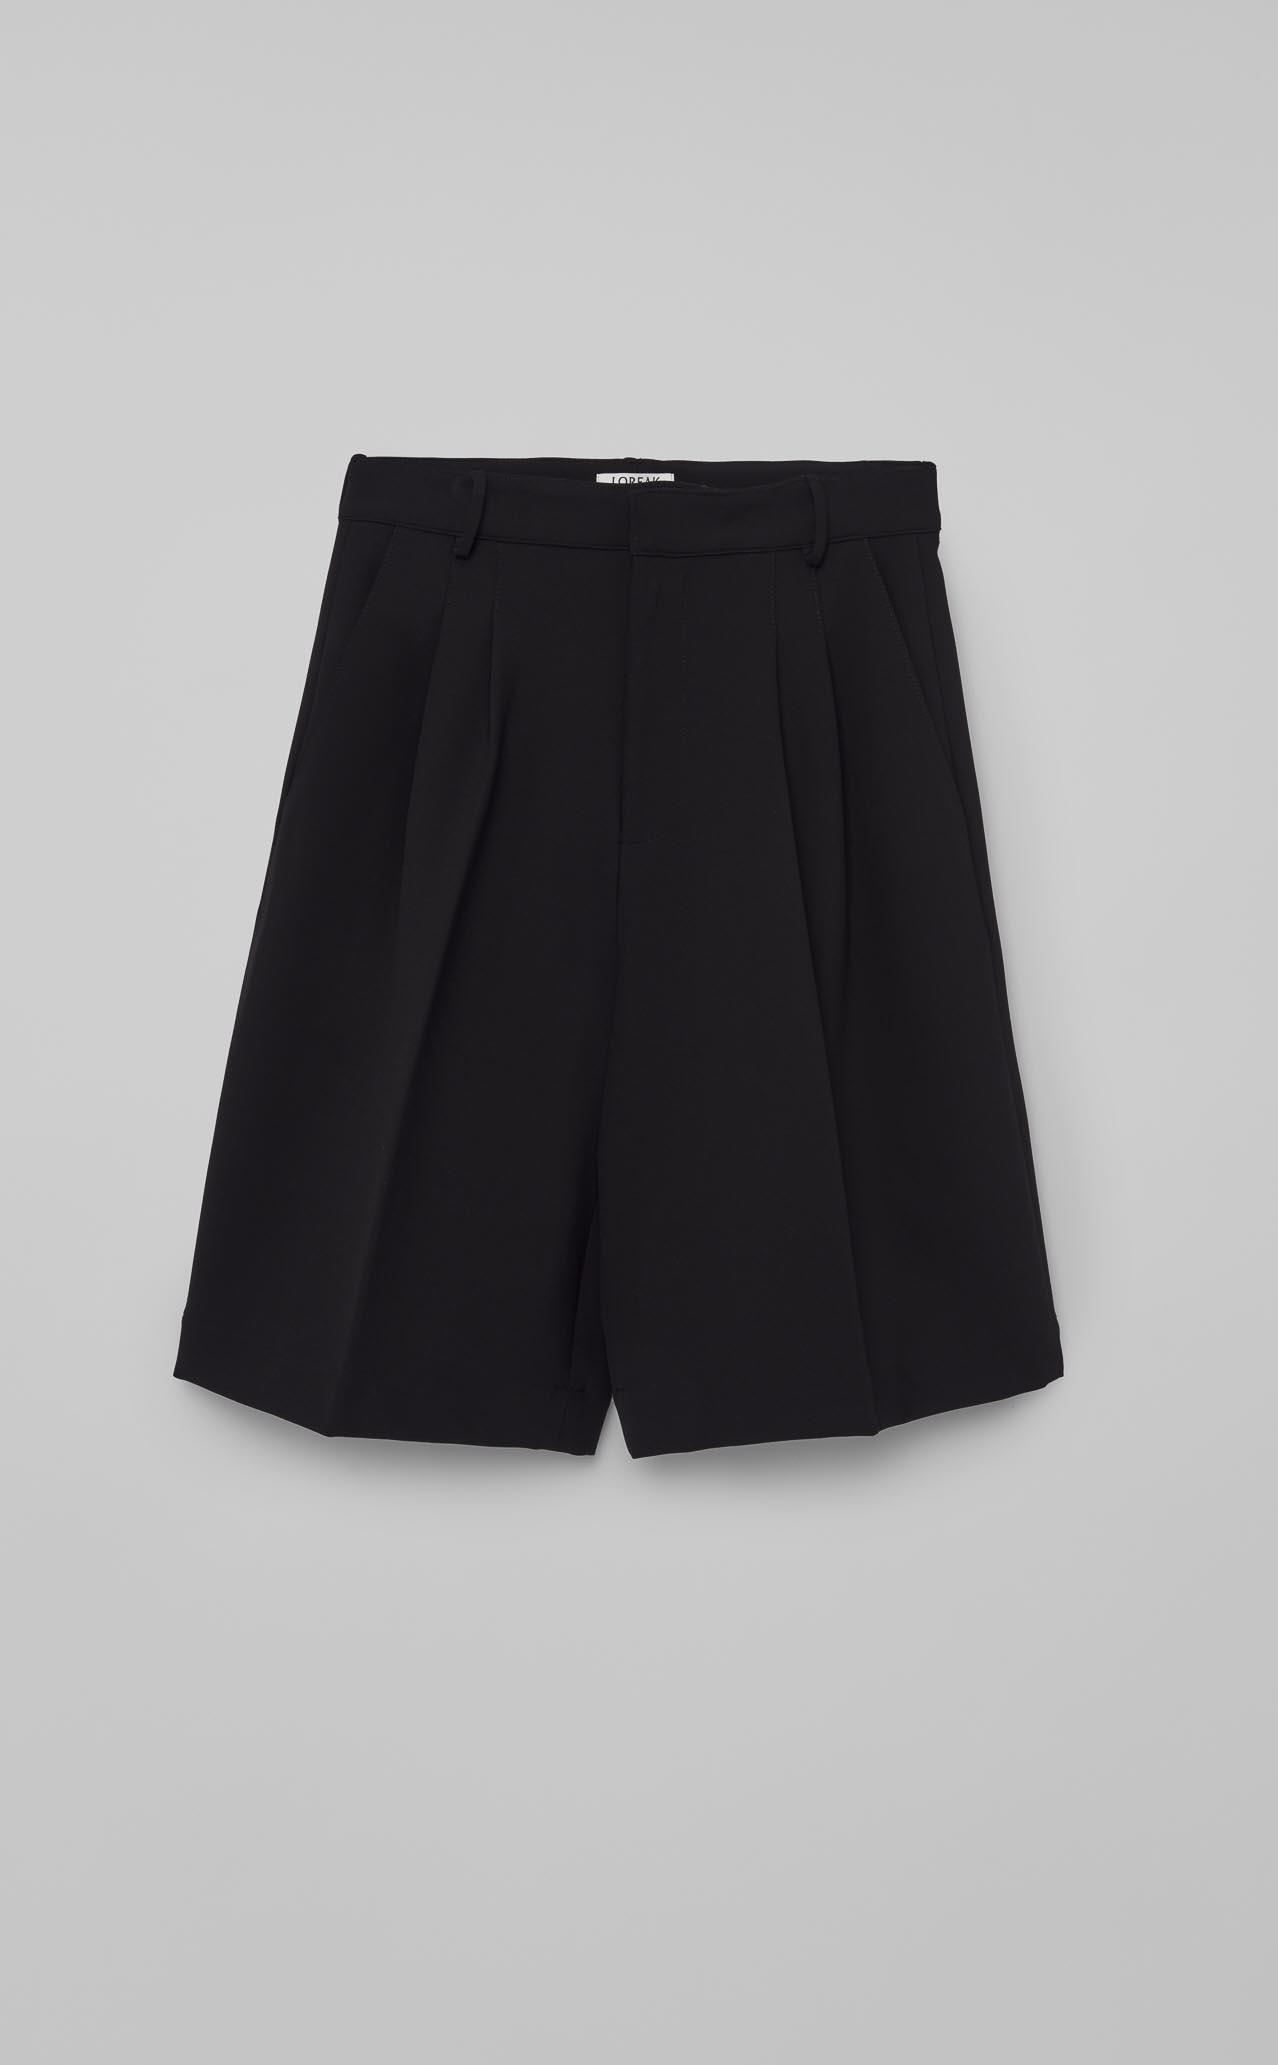 Lap Skirt